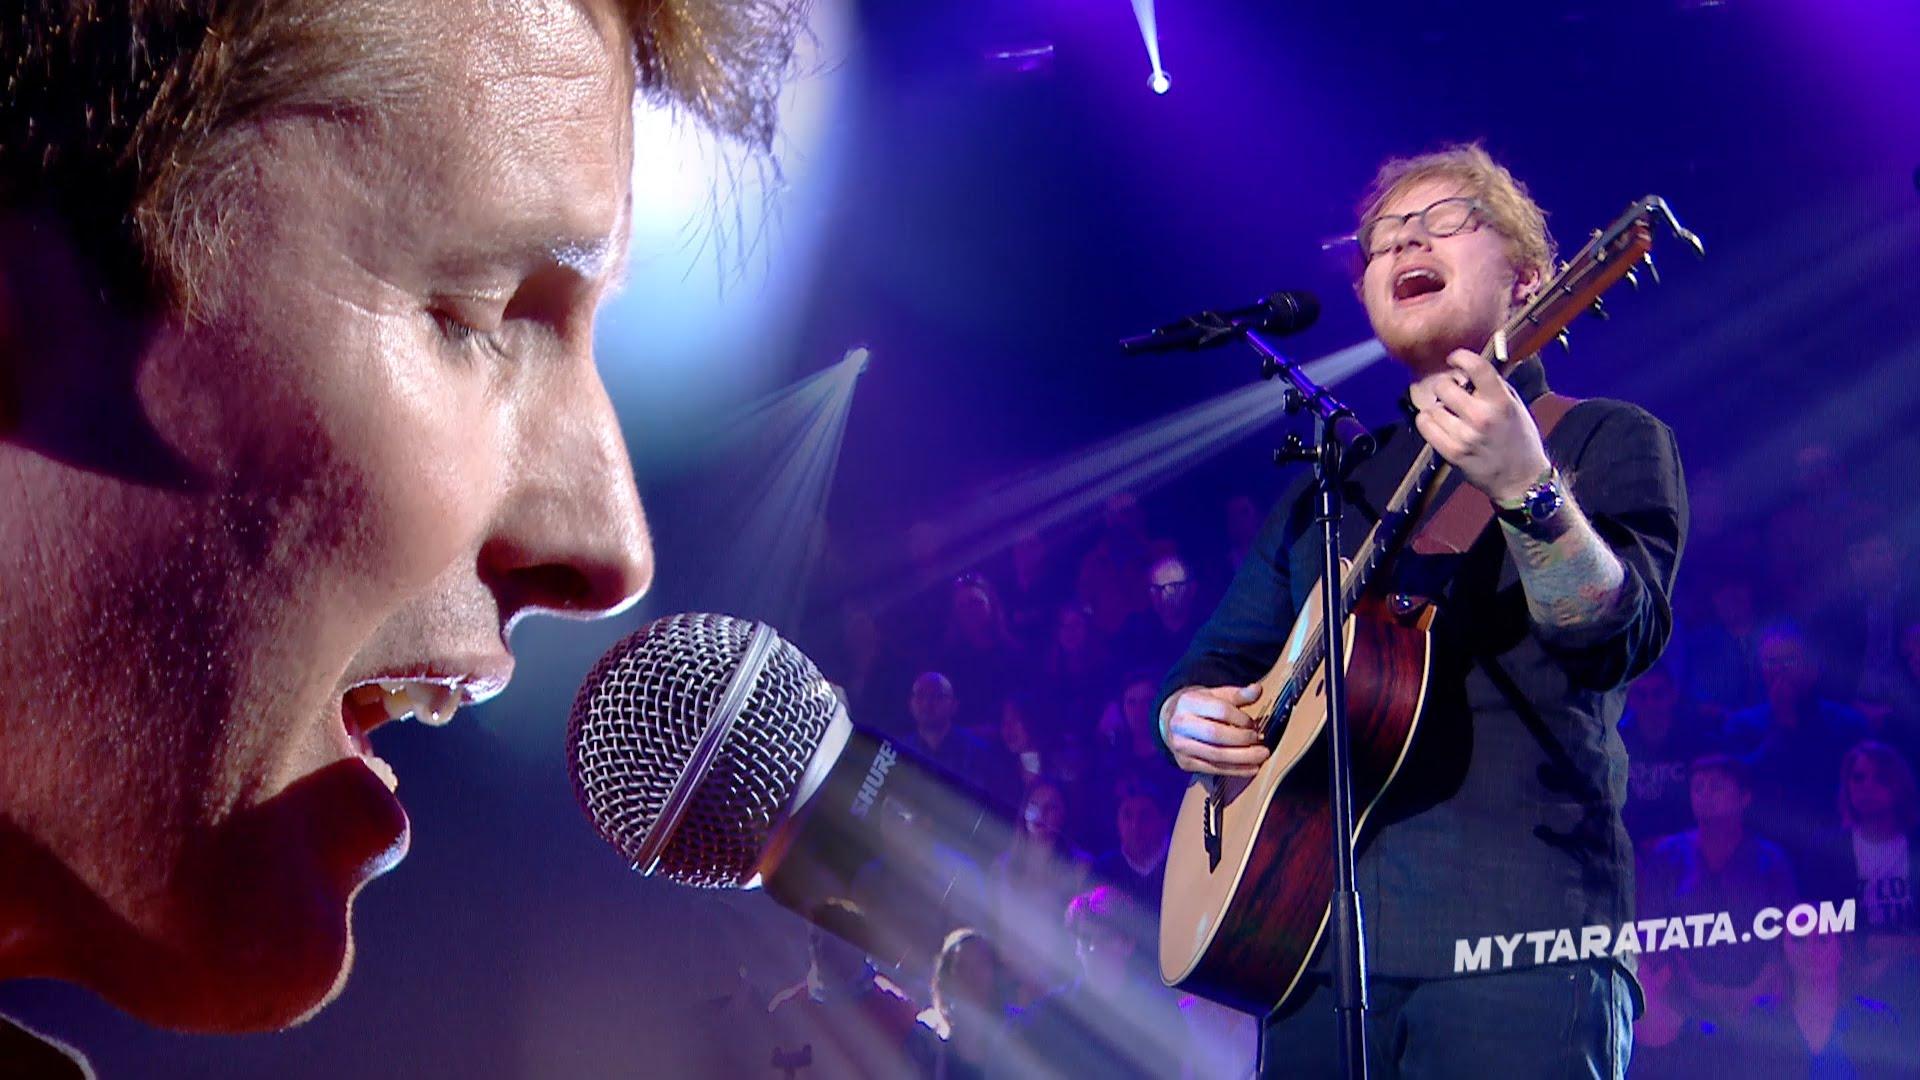 Watch: Ed Sheeran and James Blunt smash Elton John's 'Sacrifice' duet